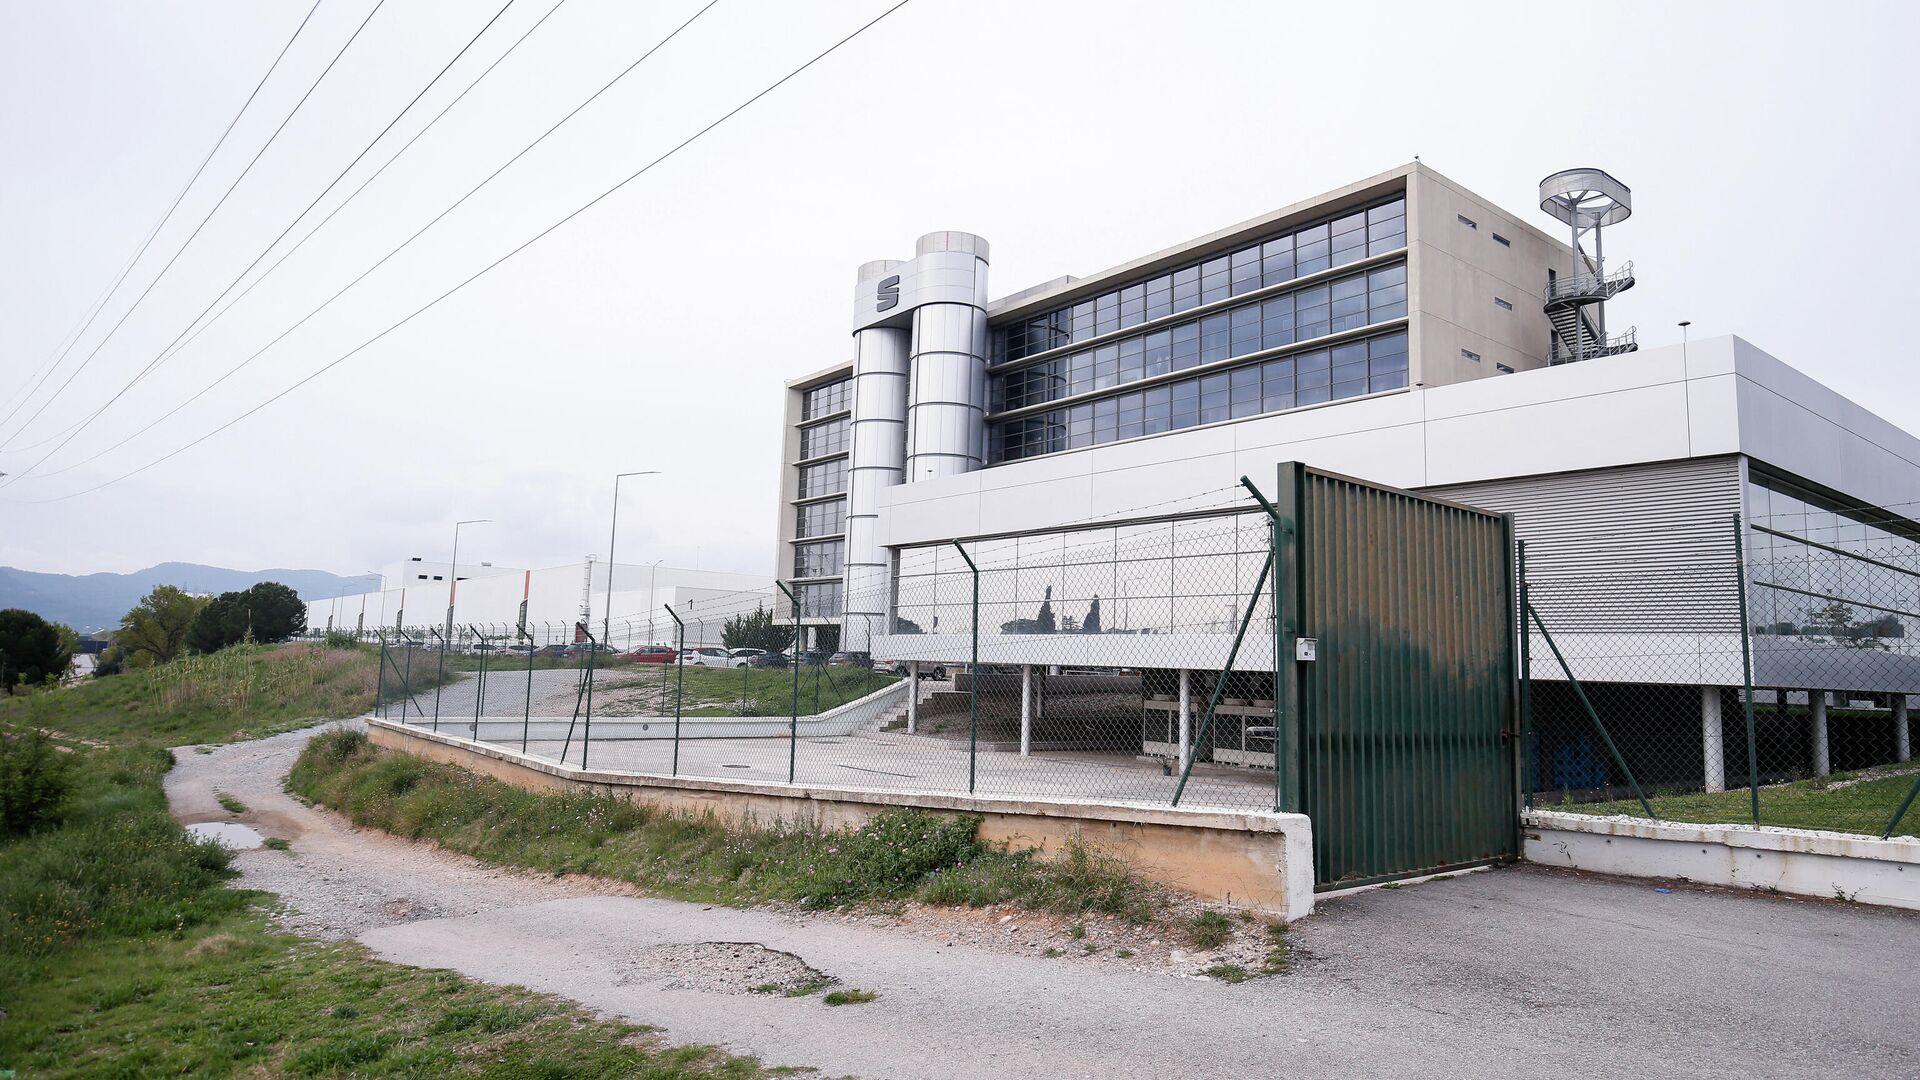 La planta de Seat en Martorell, en la provincia de Barcelona - Sputnik Mundo, 1920, 05.03.2021